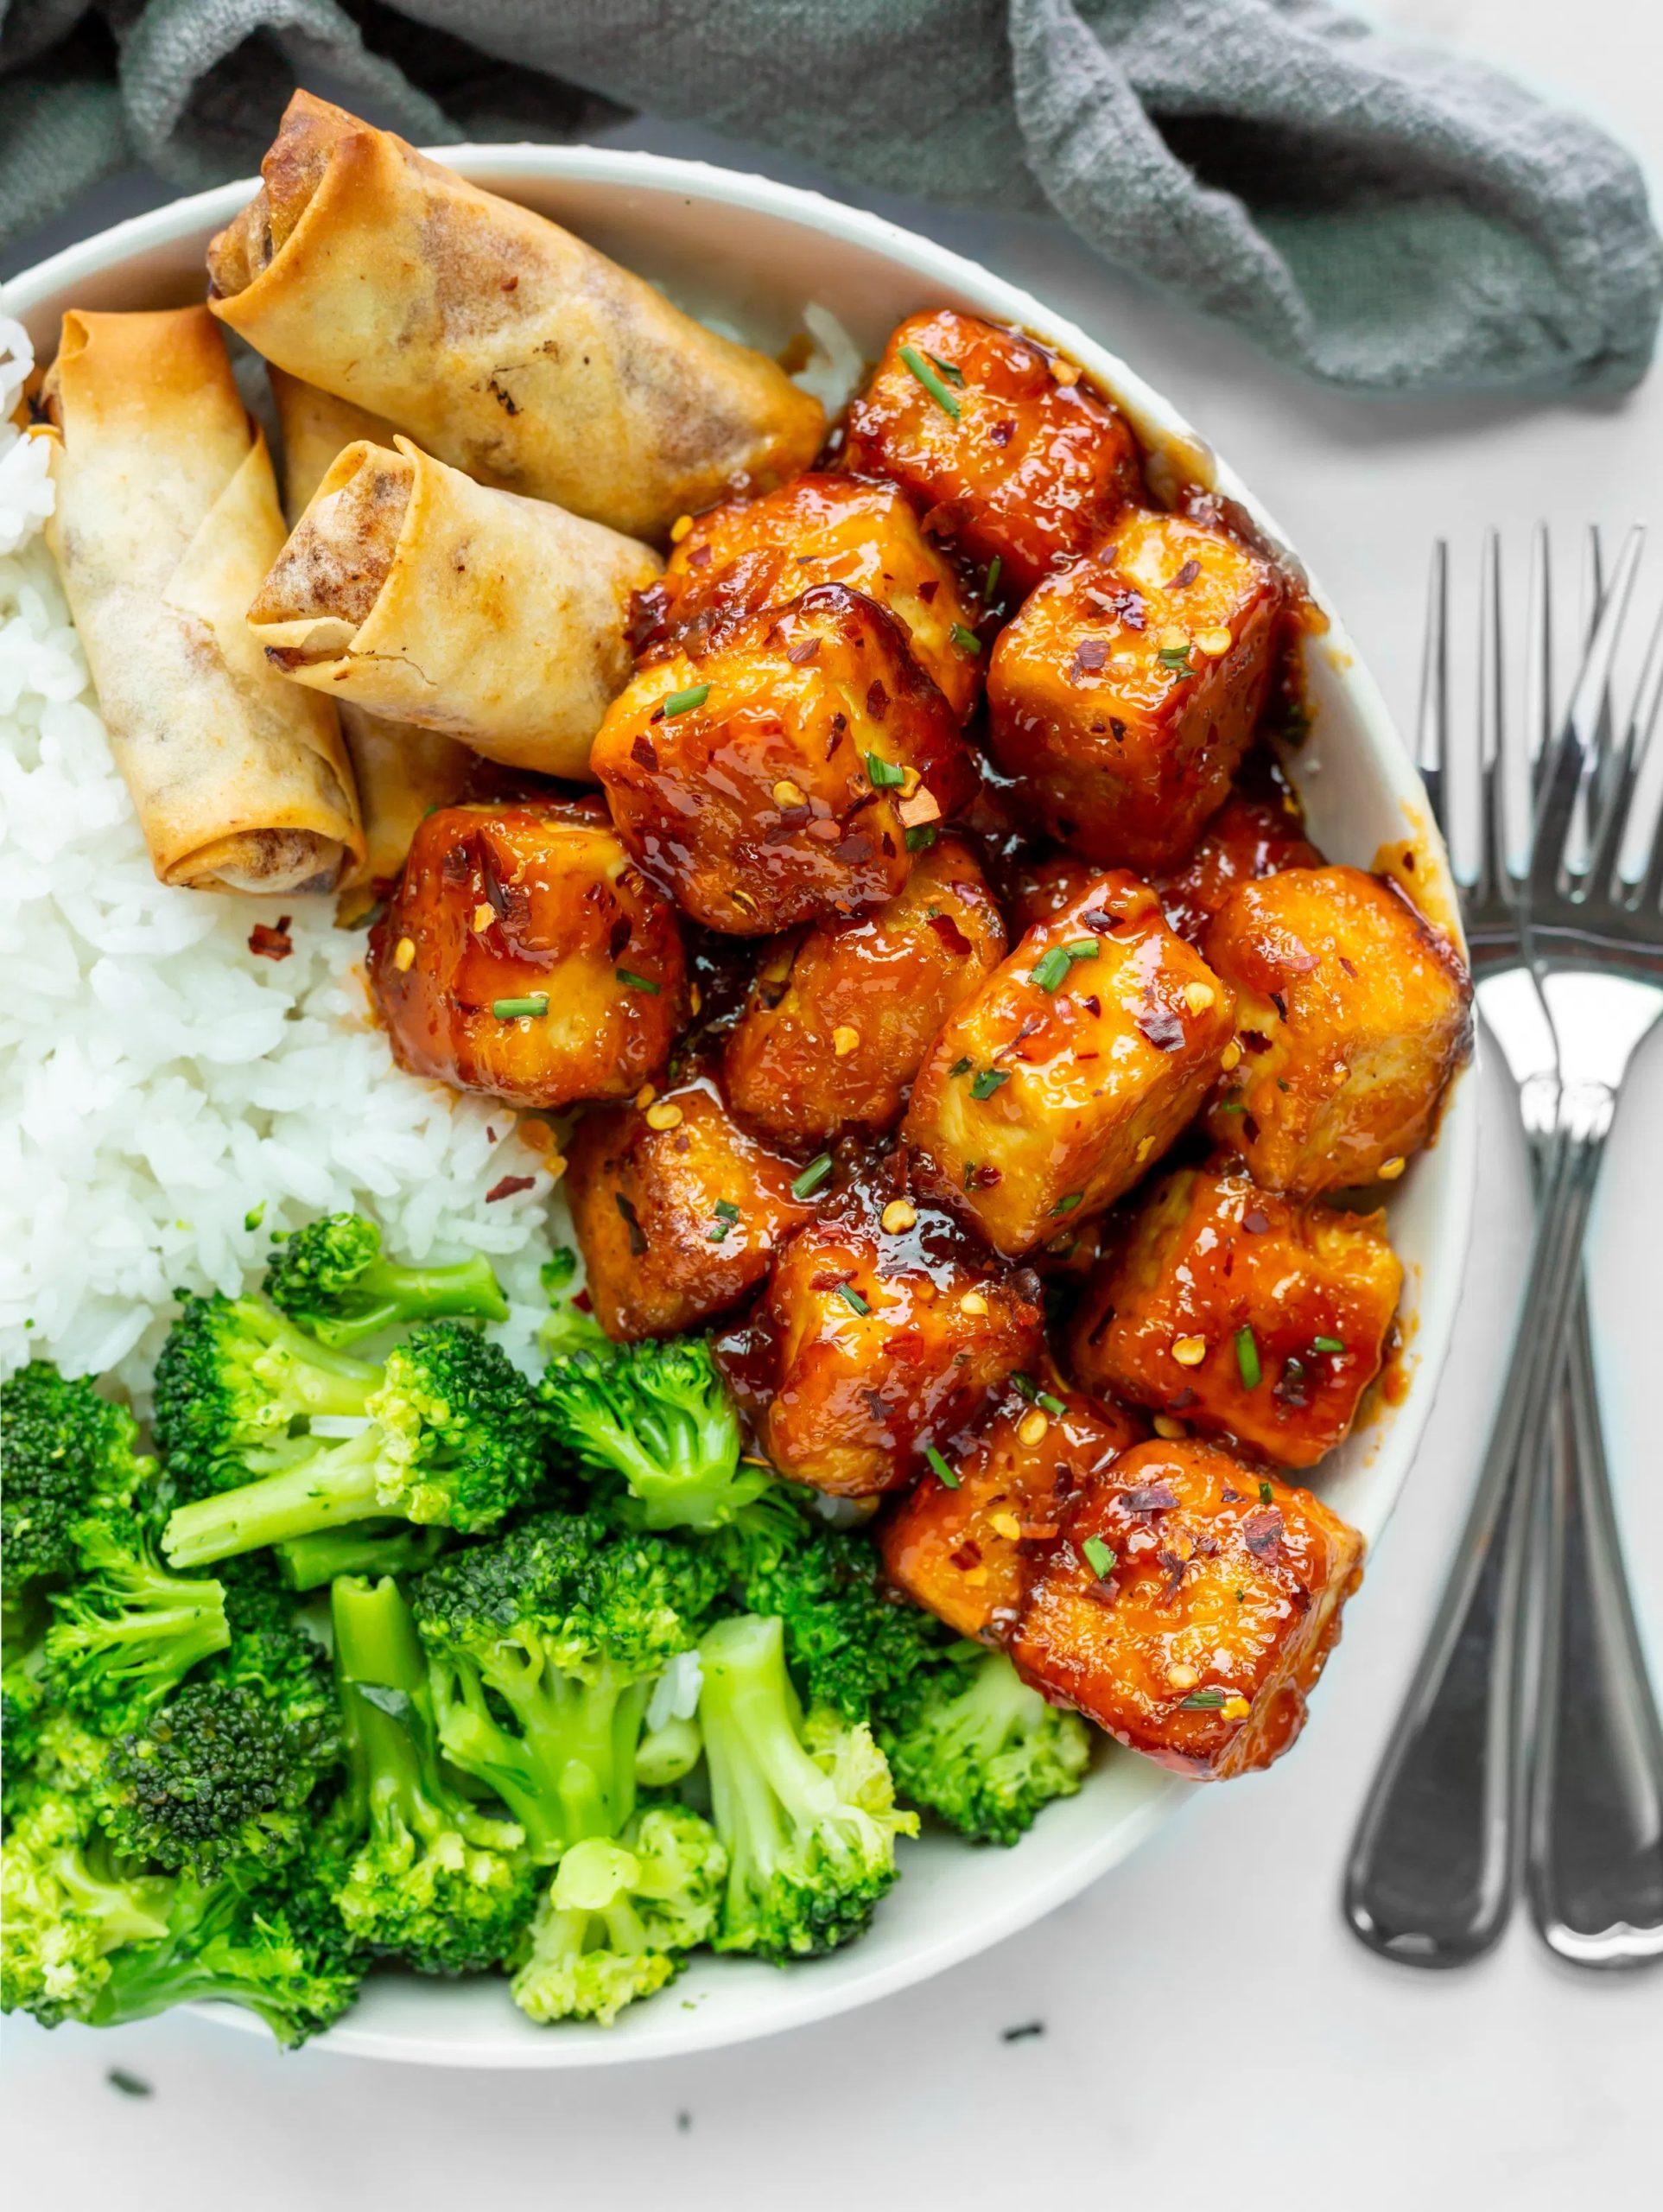 Weekly meal plan 9: Firecracker Tofu bowls at Vegan Travel Eats